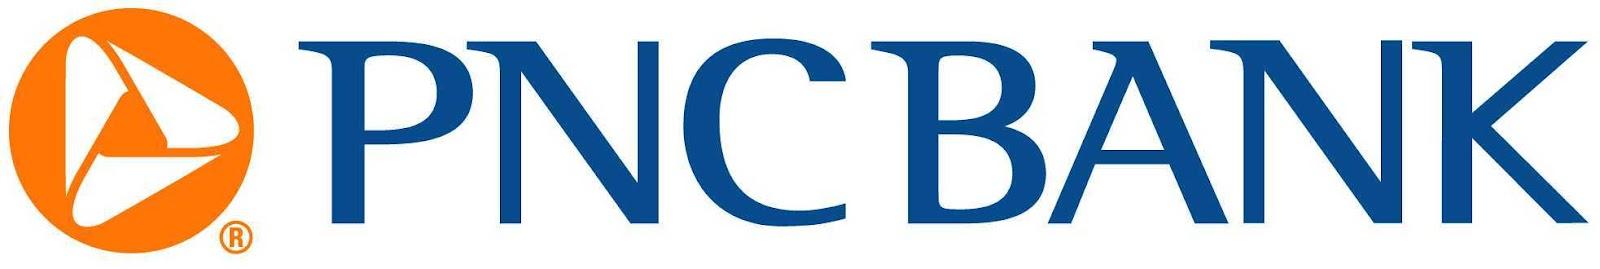 pnc bank logo vector